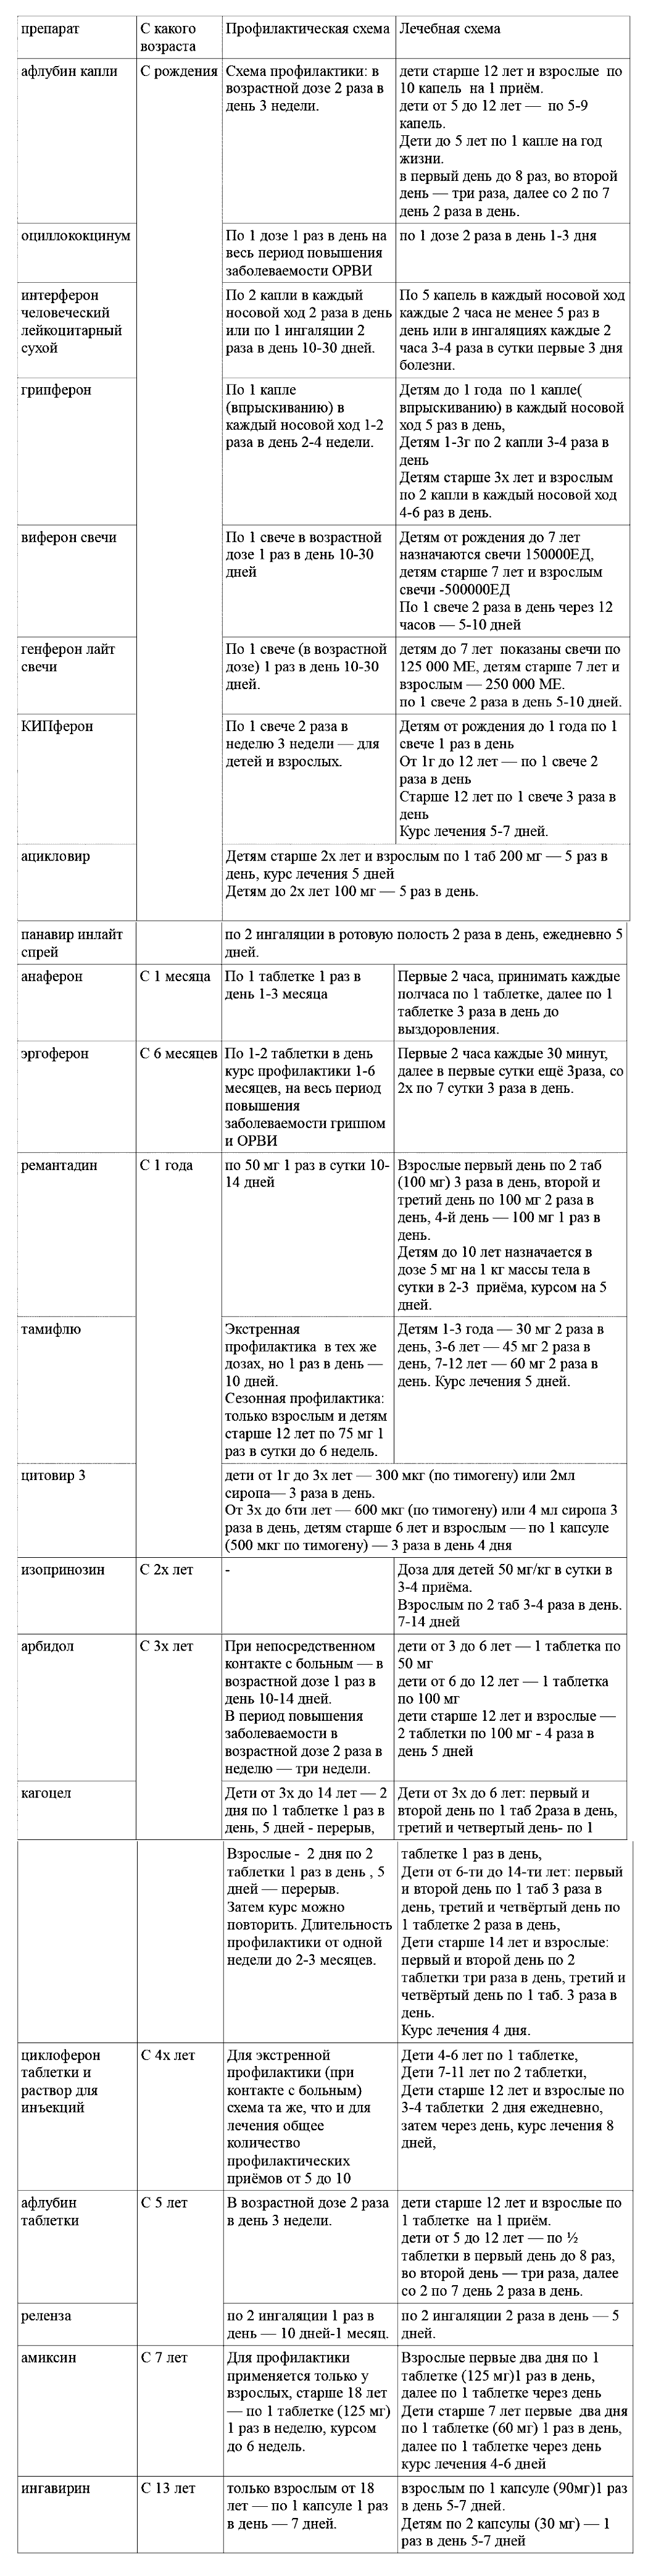 Схема приема кагоцела детям